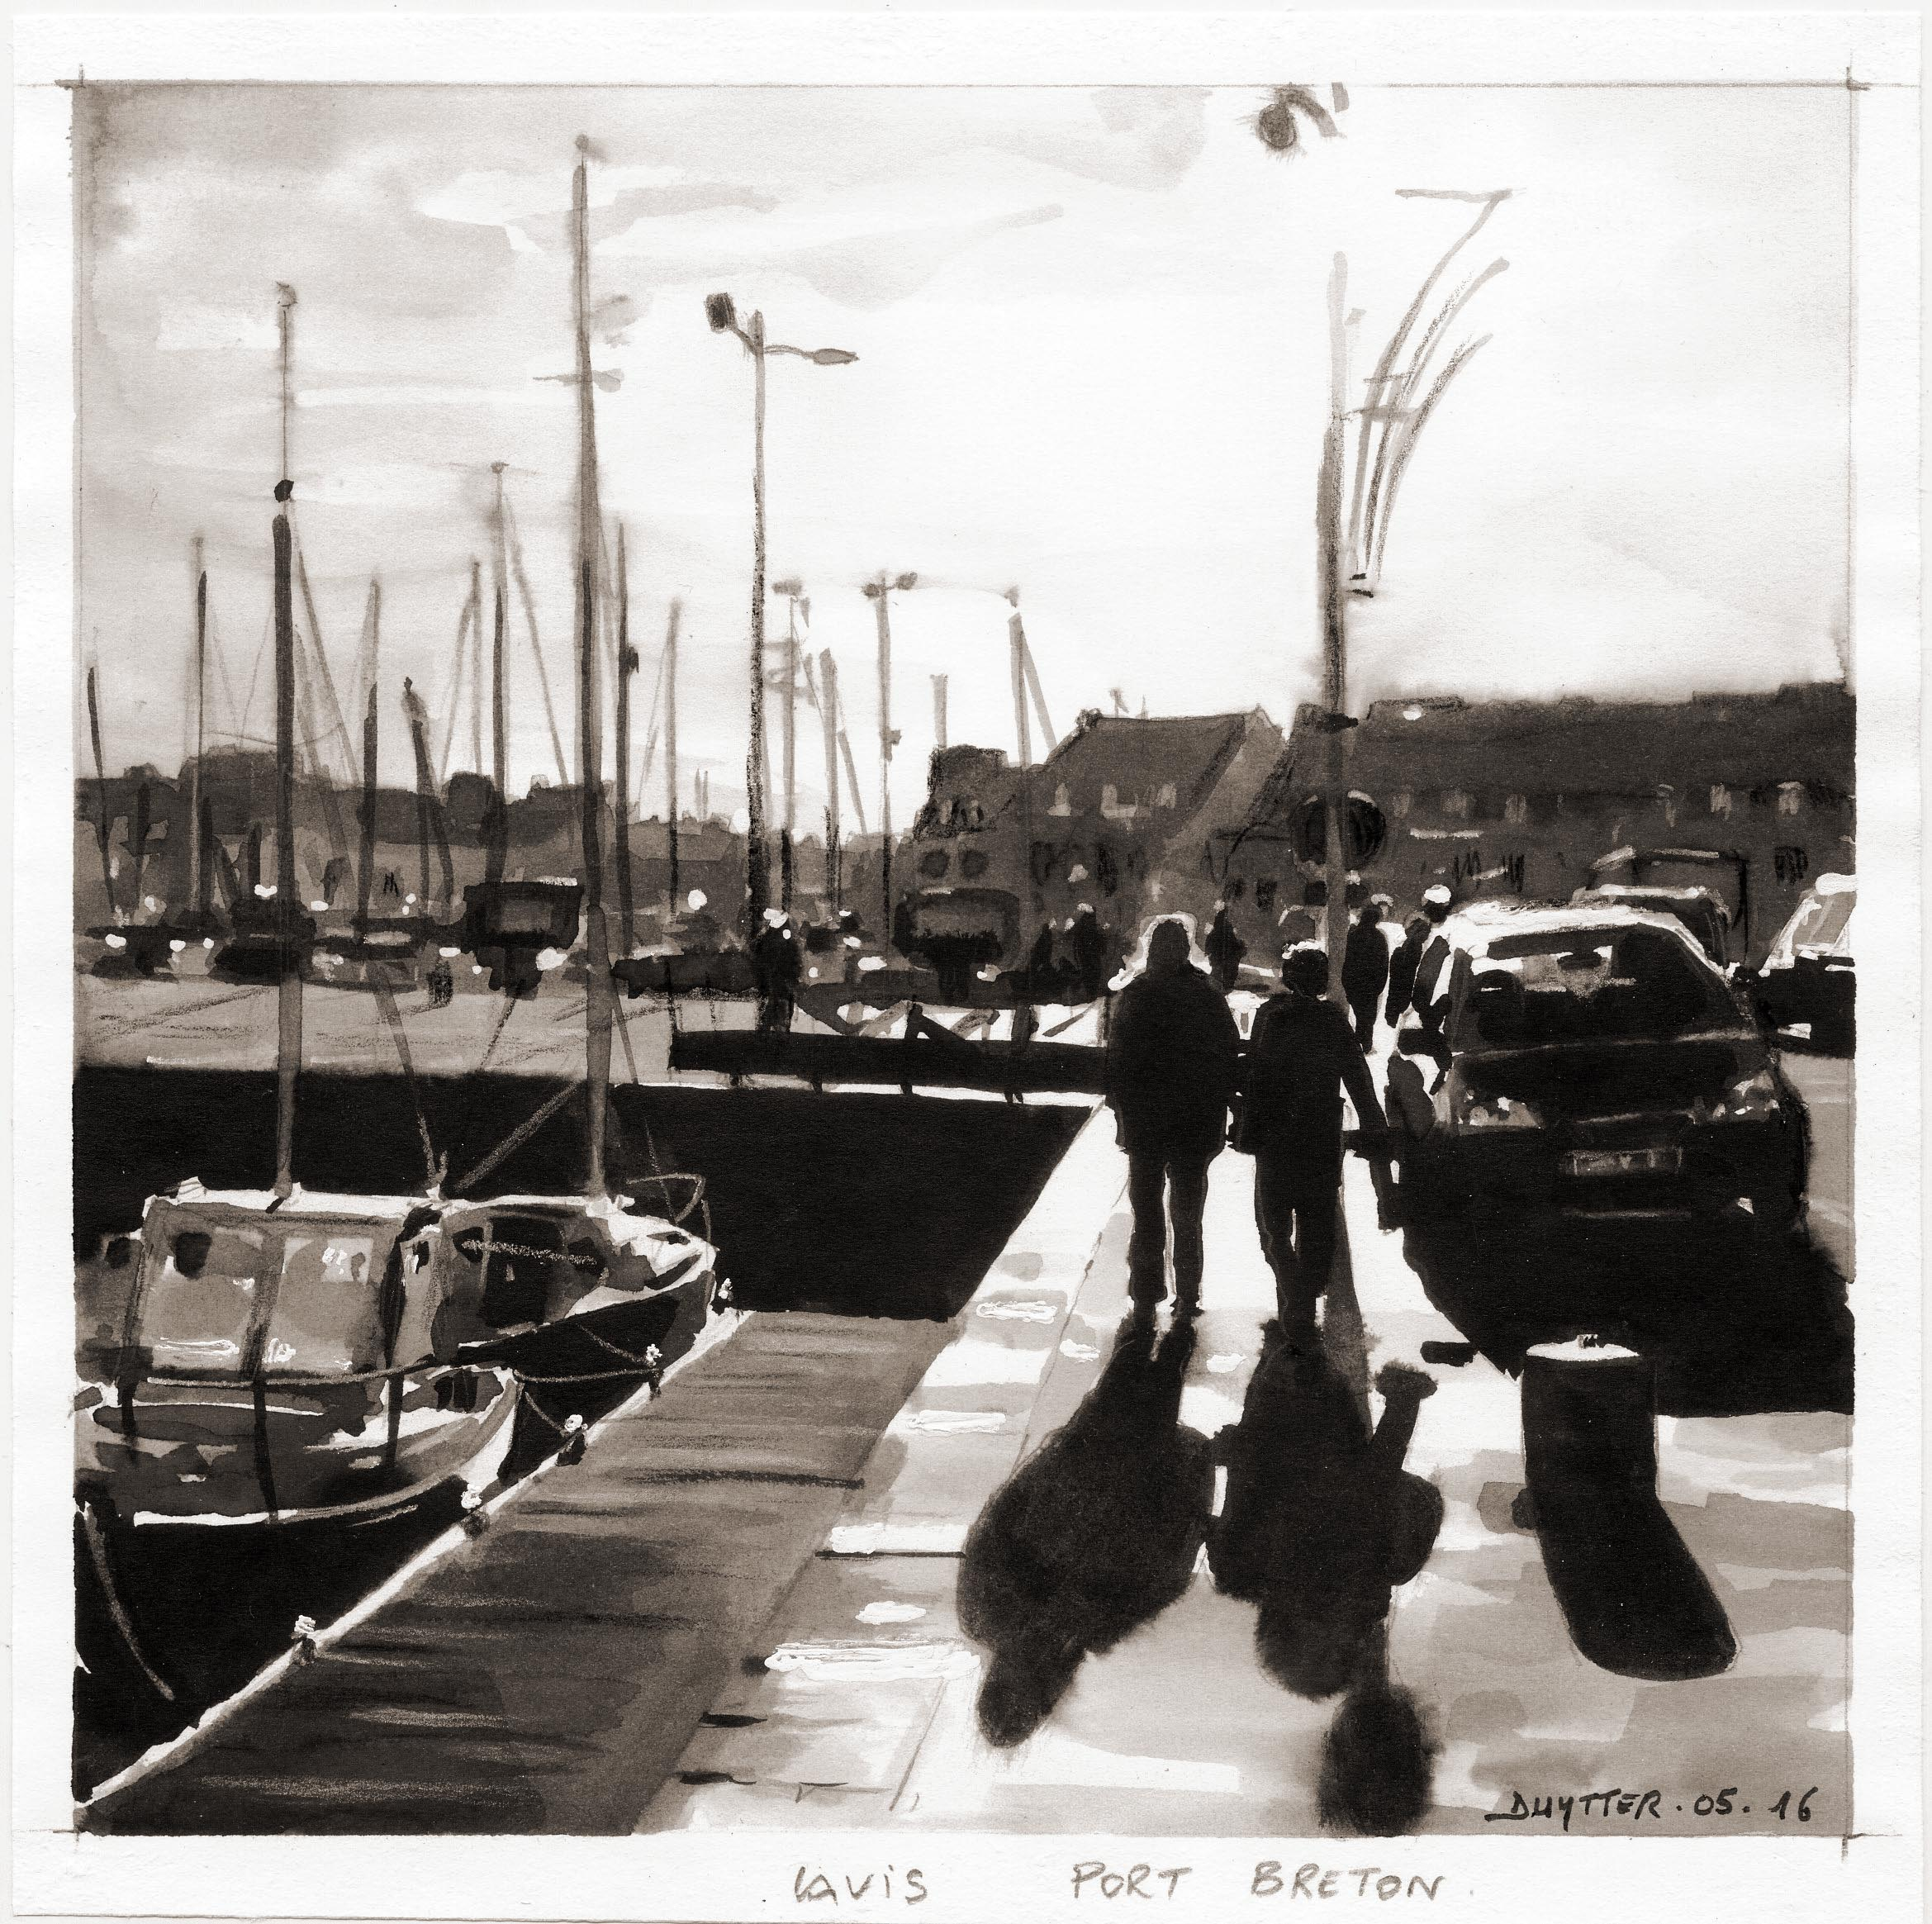 Lavis Port Breton1